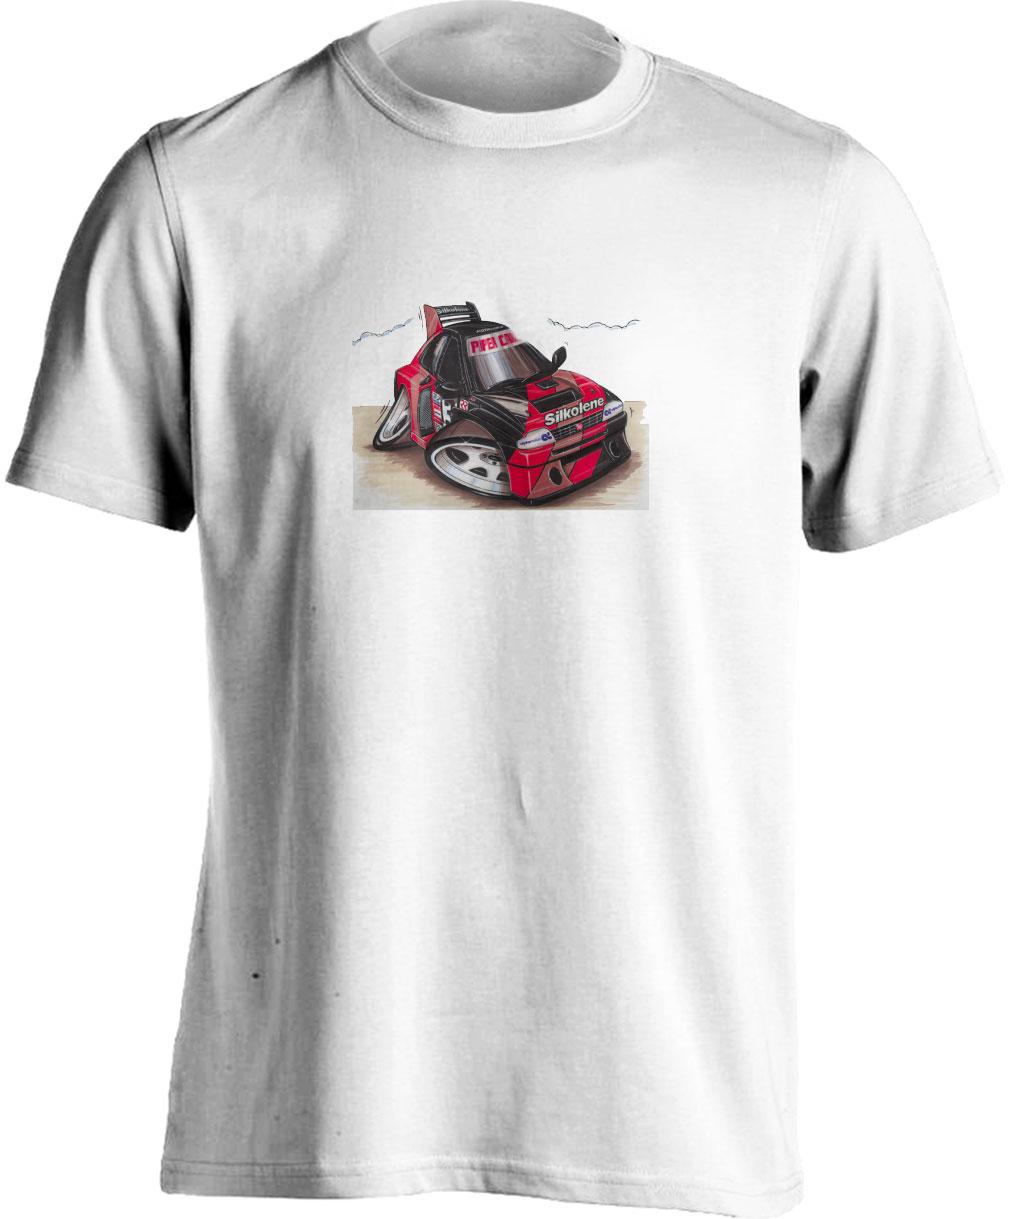 Austin Rover MG Metro 6R4 Silkolene Livery-0505- Child's Unisex T Shirt